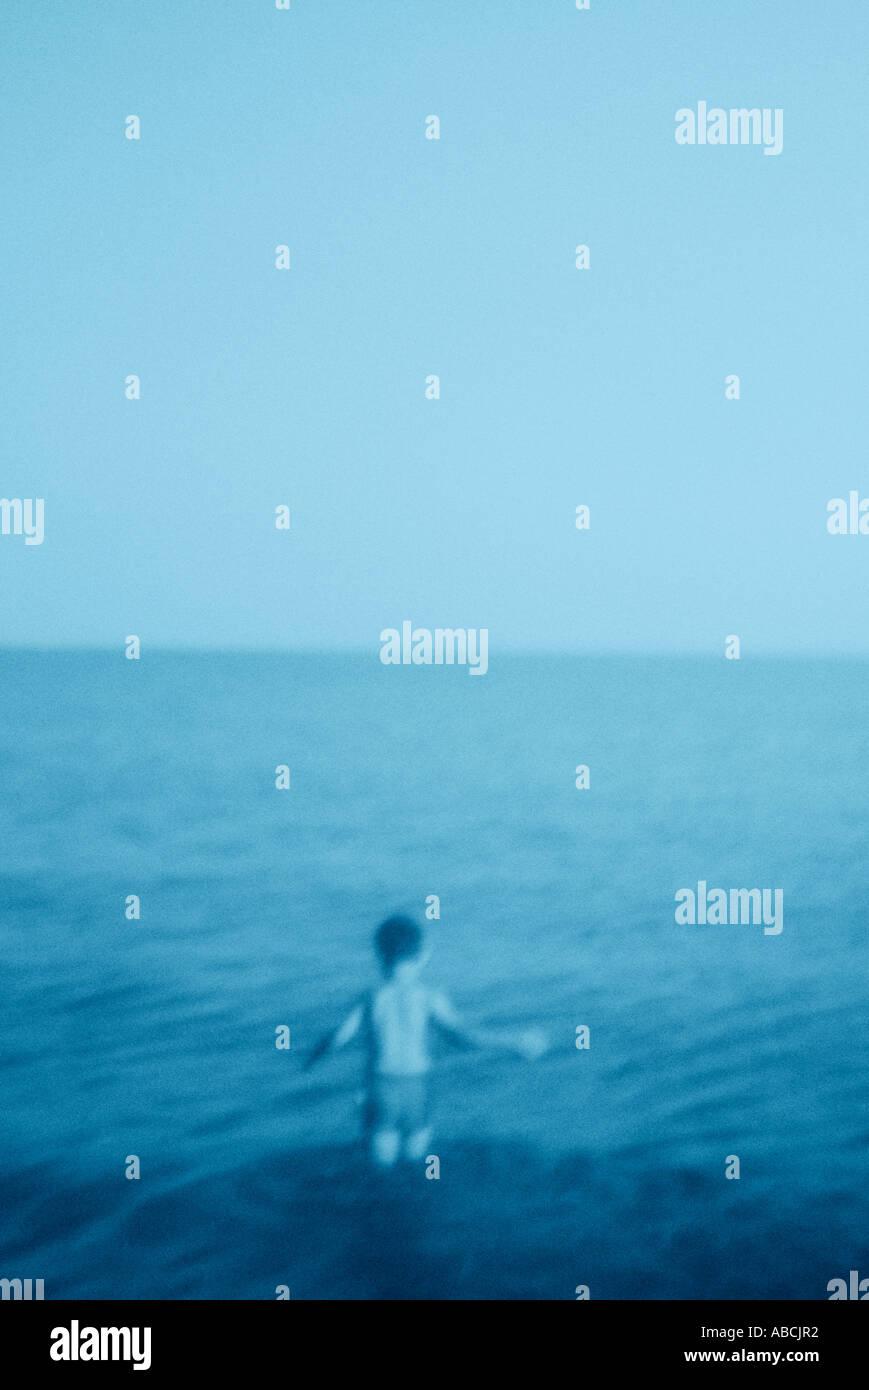 Jeune garçon patauger dans la mer (cyanotype) Photo Stock